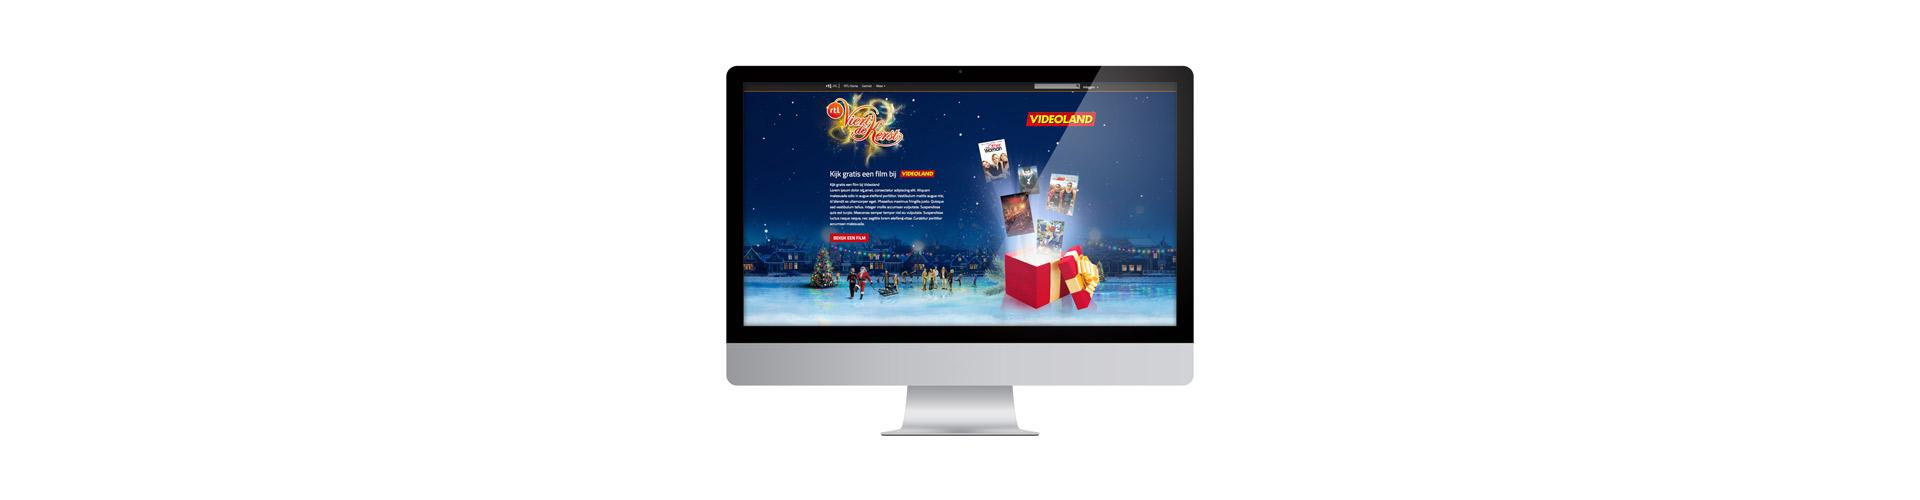 Rtl Nederland Rtl Viert De Kerst Livewall Concepts